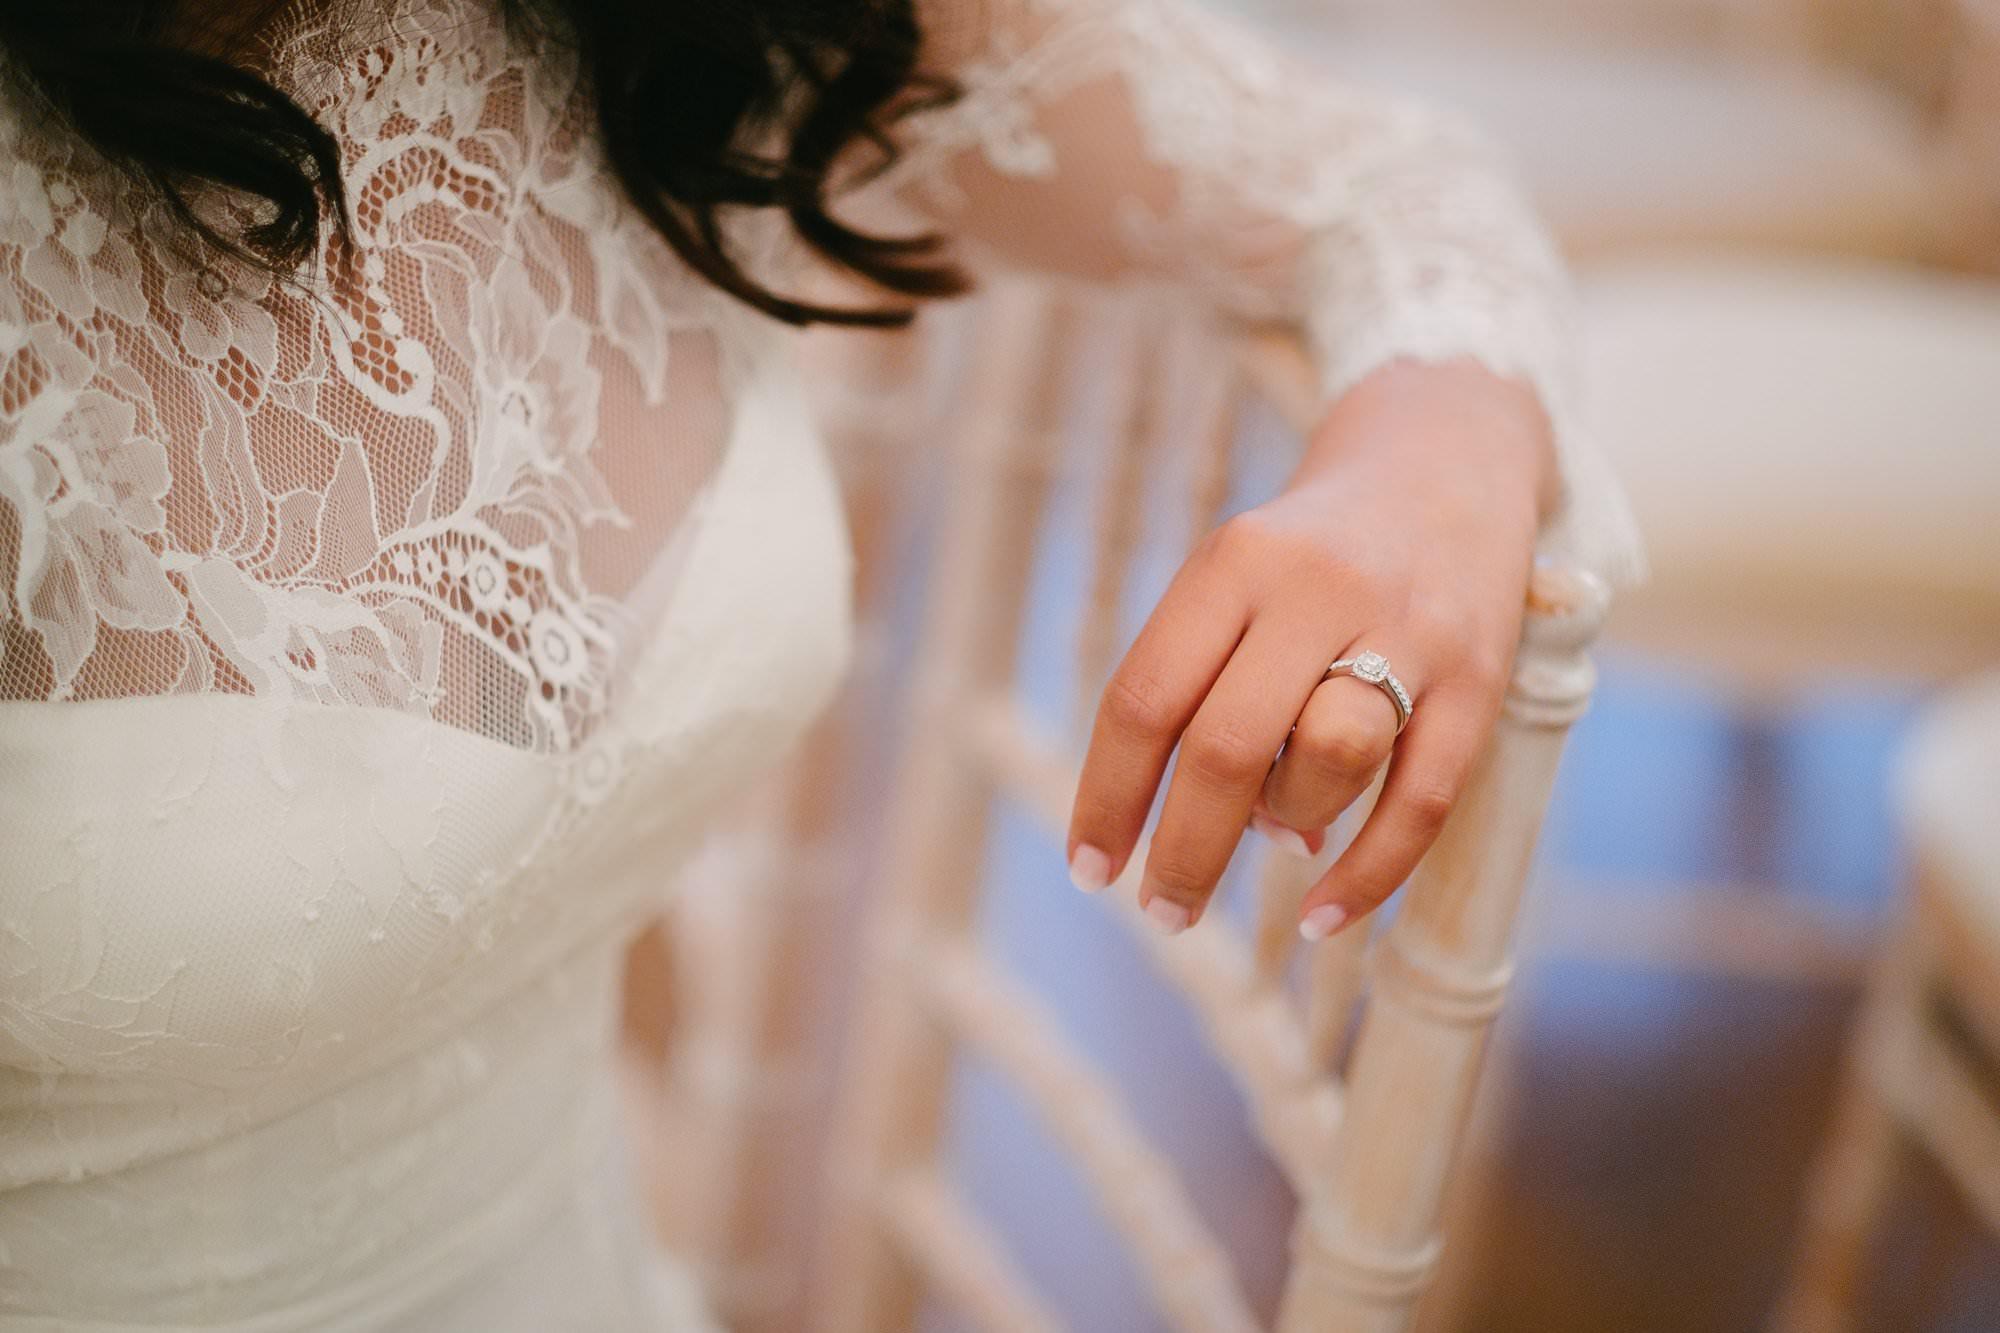 asia house london wedding photographer 032 - Rachel + Gabriel   Asia House Wedding Photography